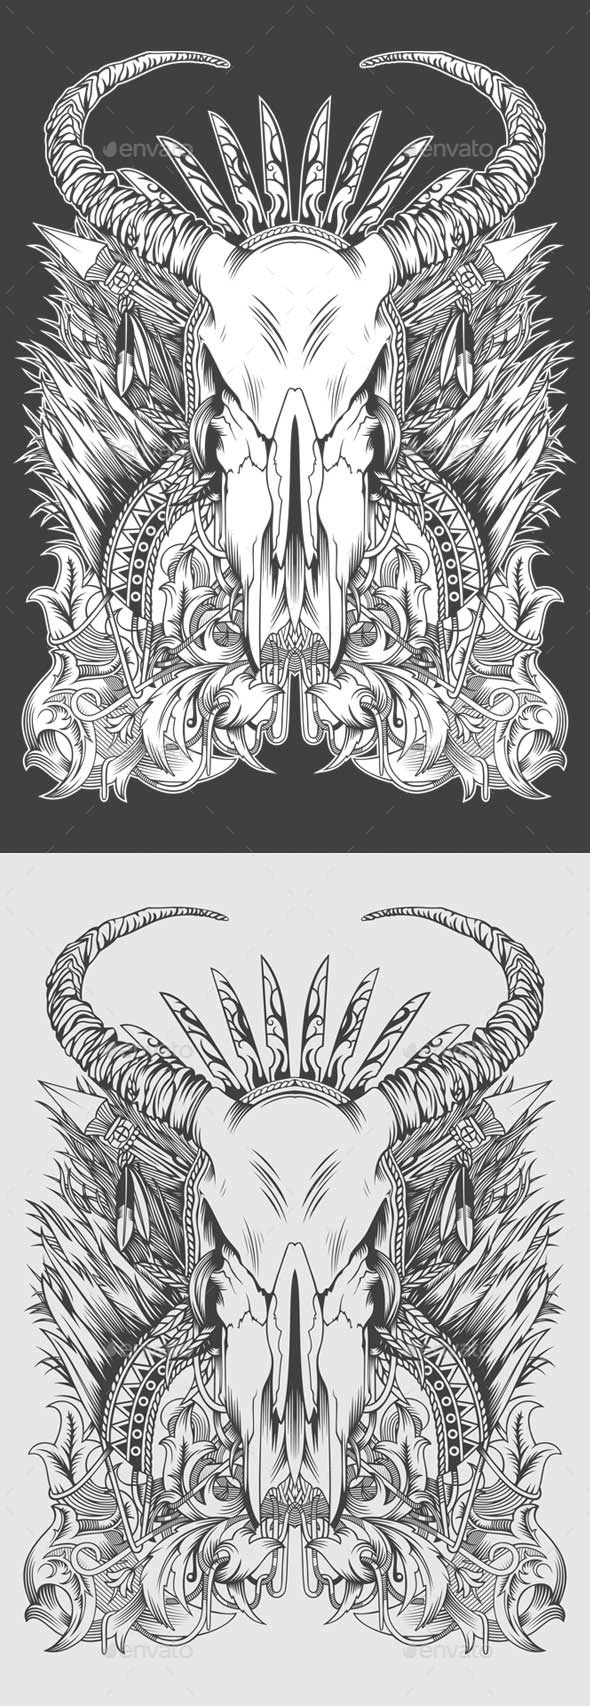 GraphicRiver Skull Illustration 10601018